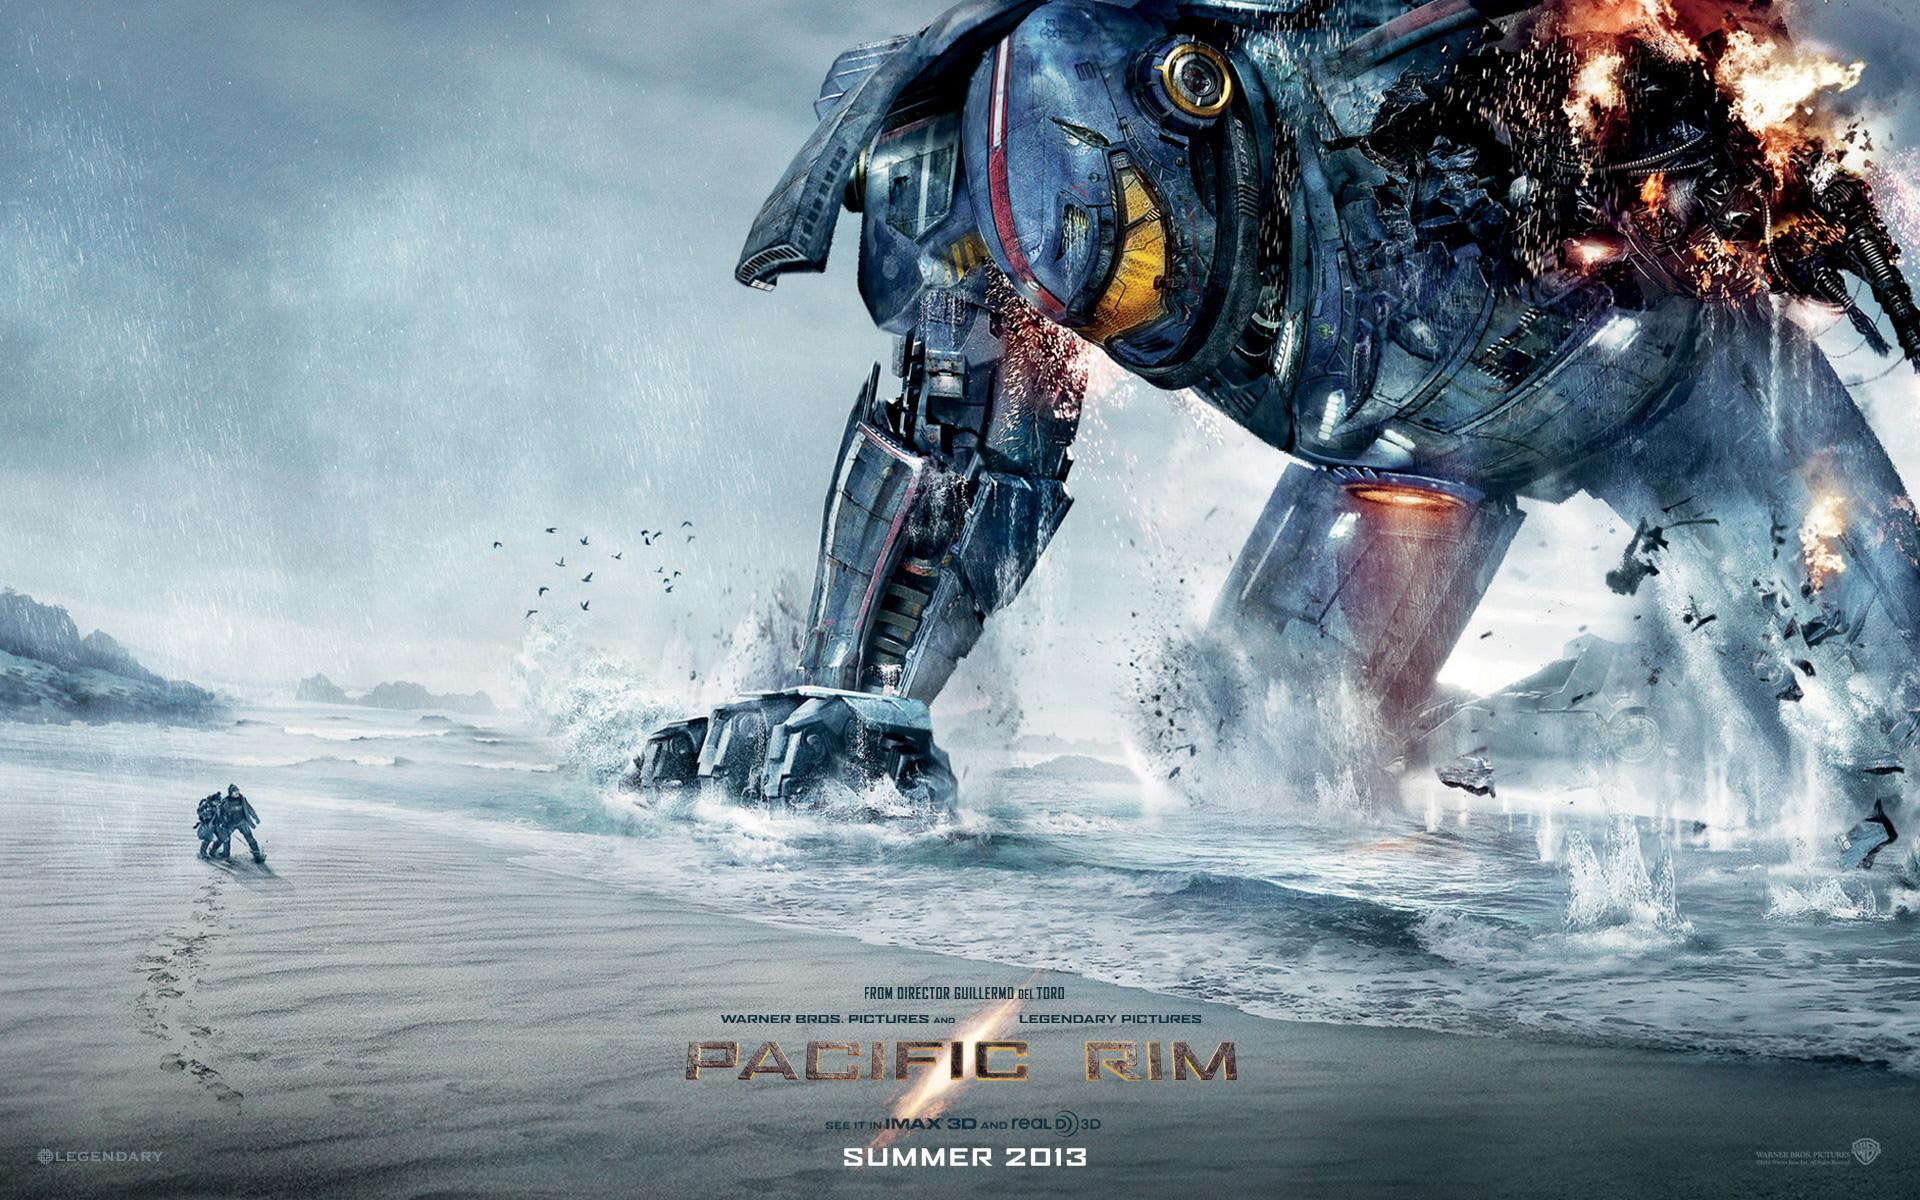 Film review: Pacific Rim (2013) | The Blog of Big Ideas Pacific Rim 2013